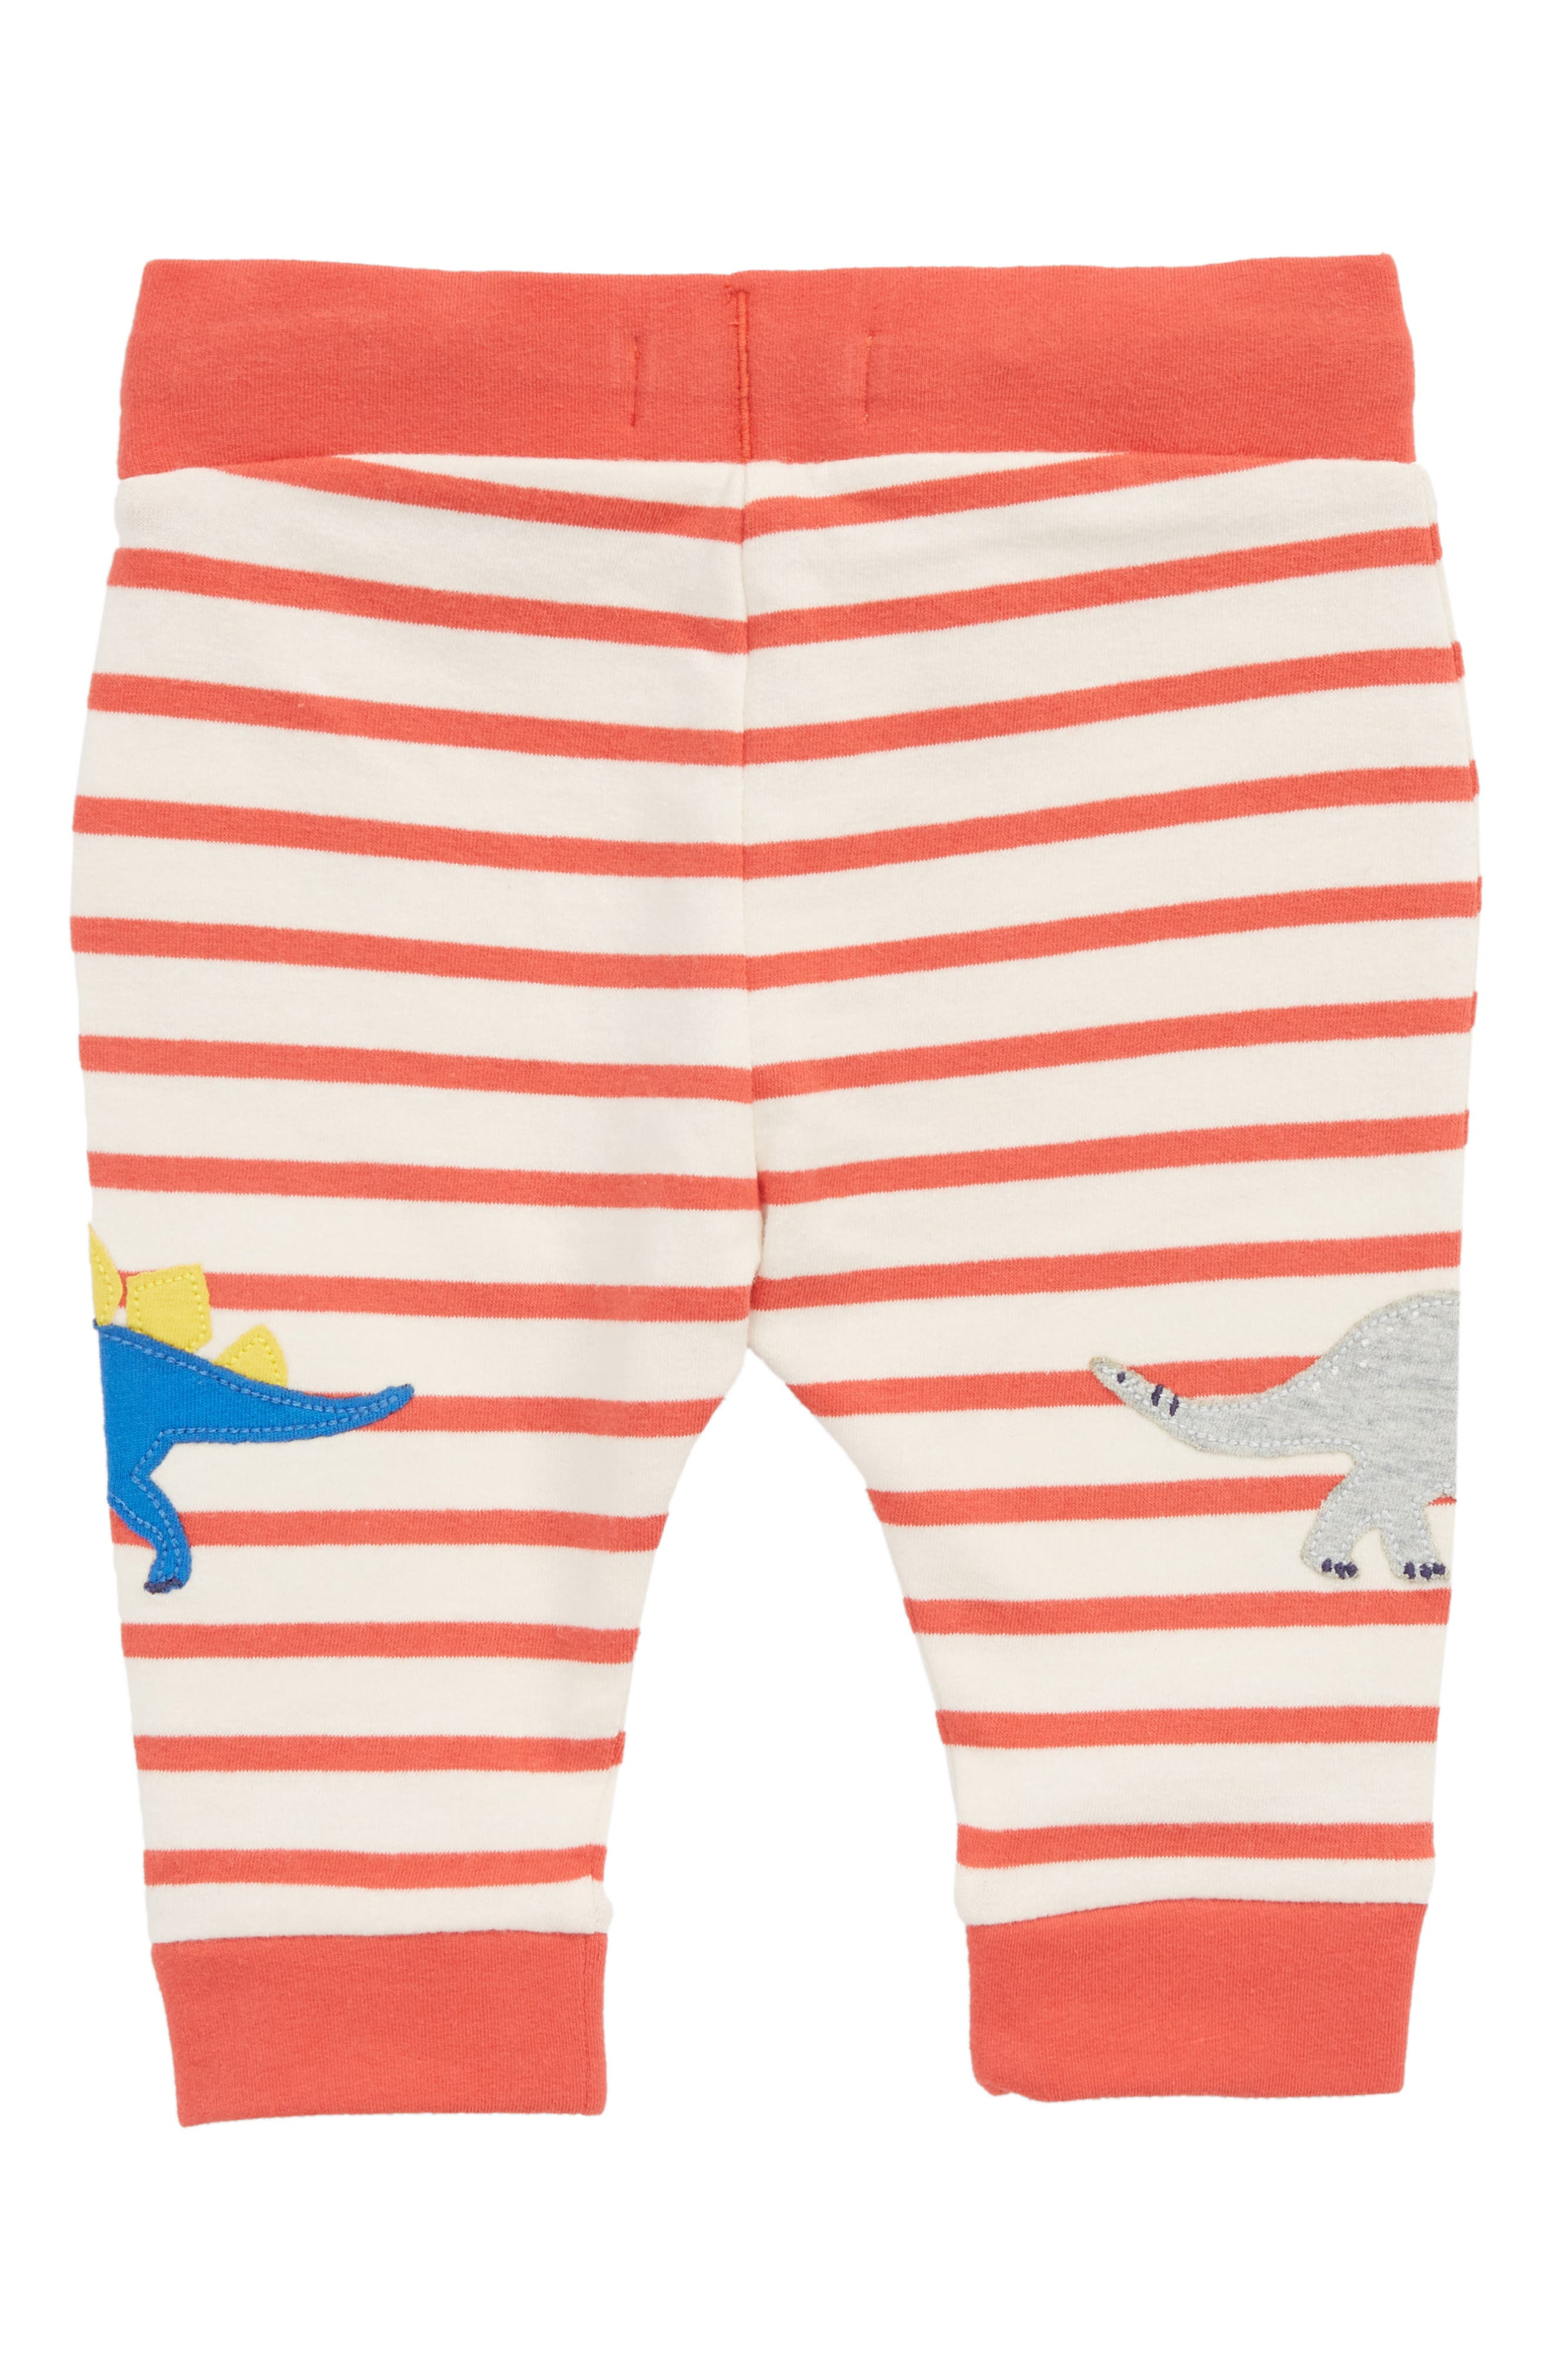 Fun Dino Appliqué Jersey Pants,                             Alternate thumbnail 2, color,                             Crayon Red